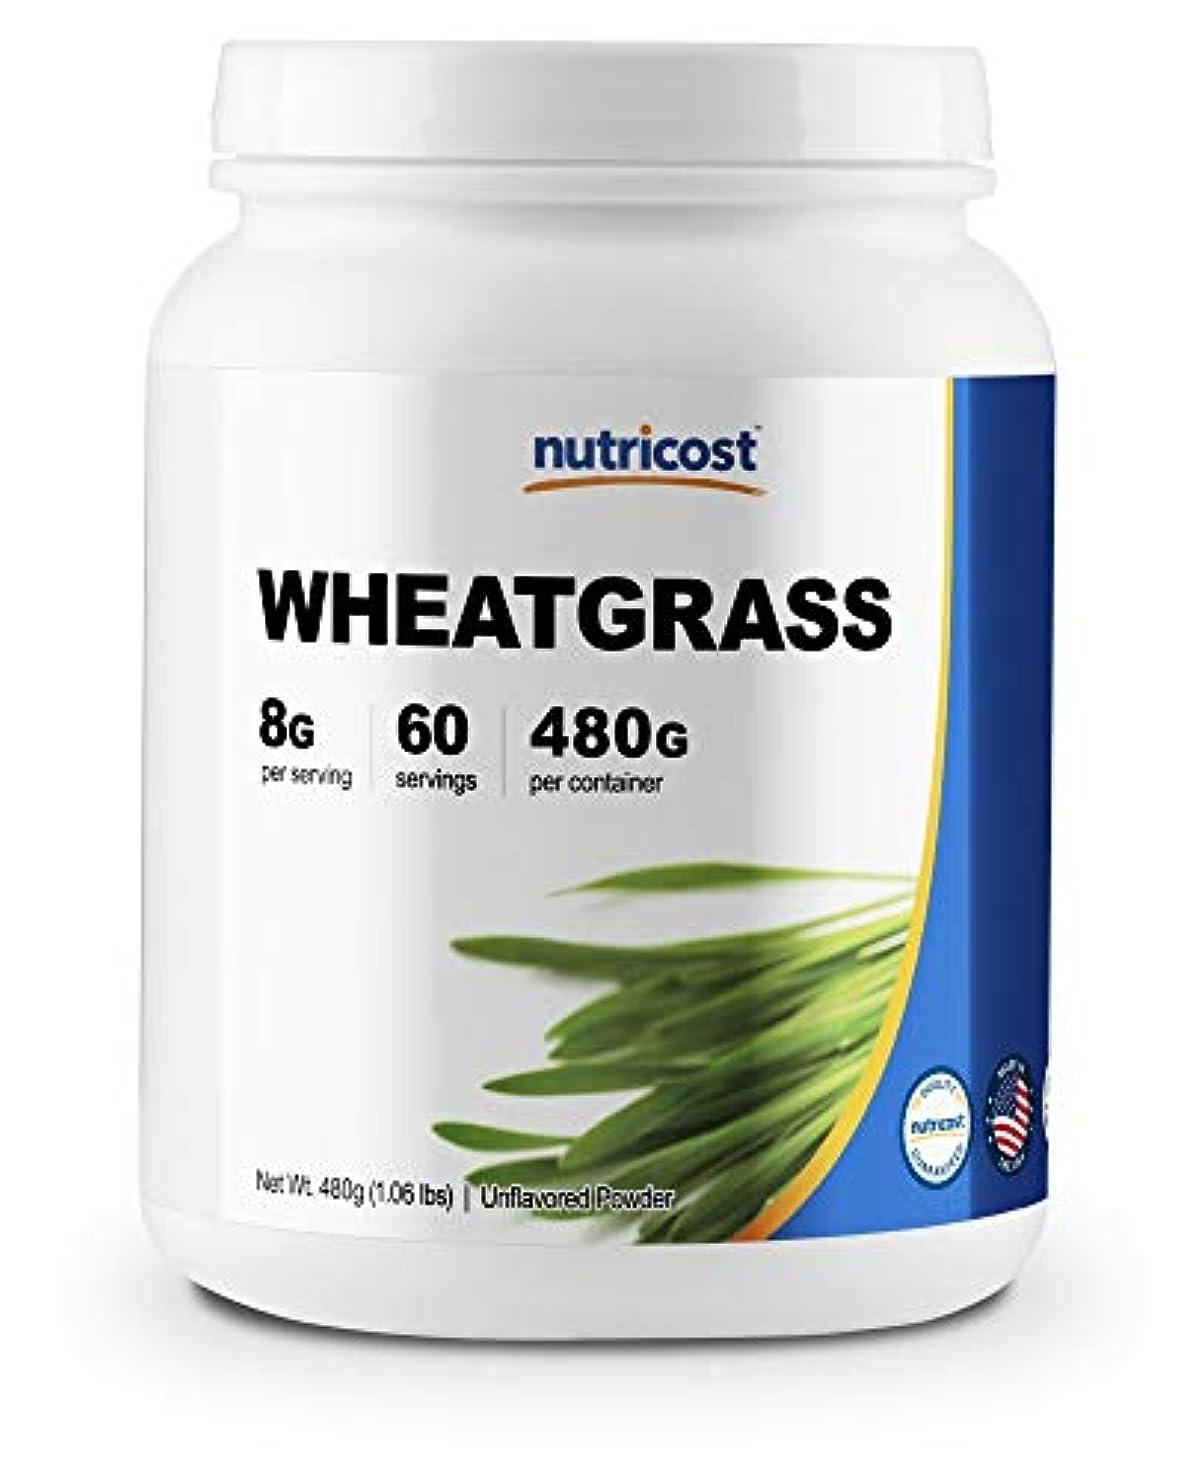 Nutricost ウィートグラスパウダー (小麦若葉)、60食分、非GMO、グルテンフリー